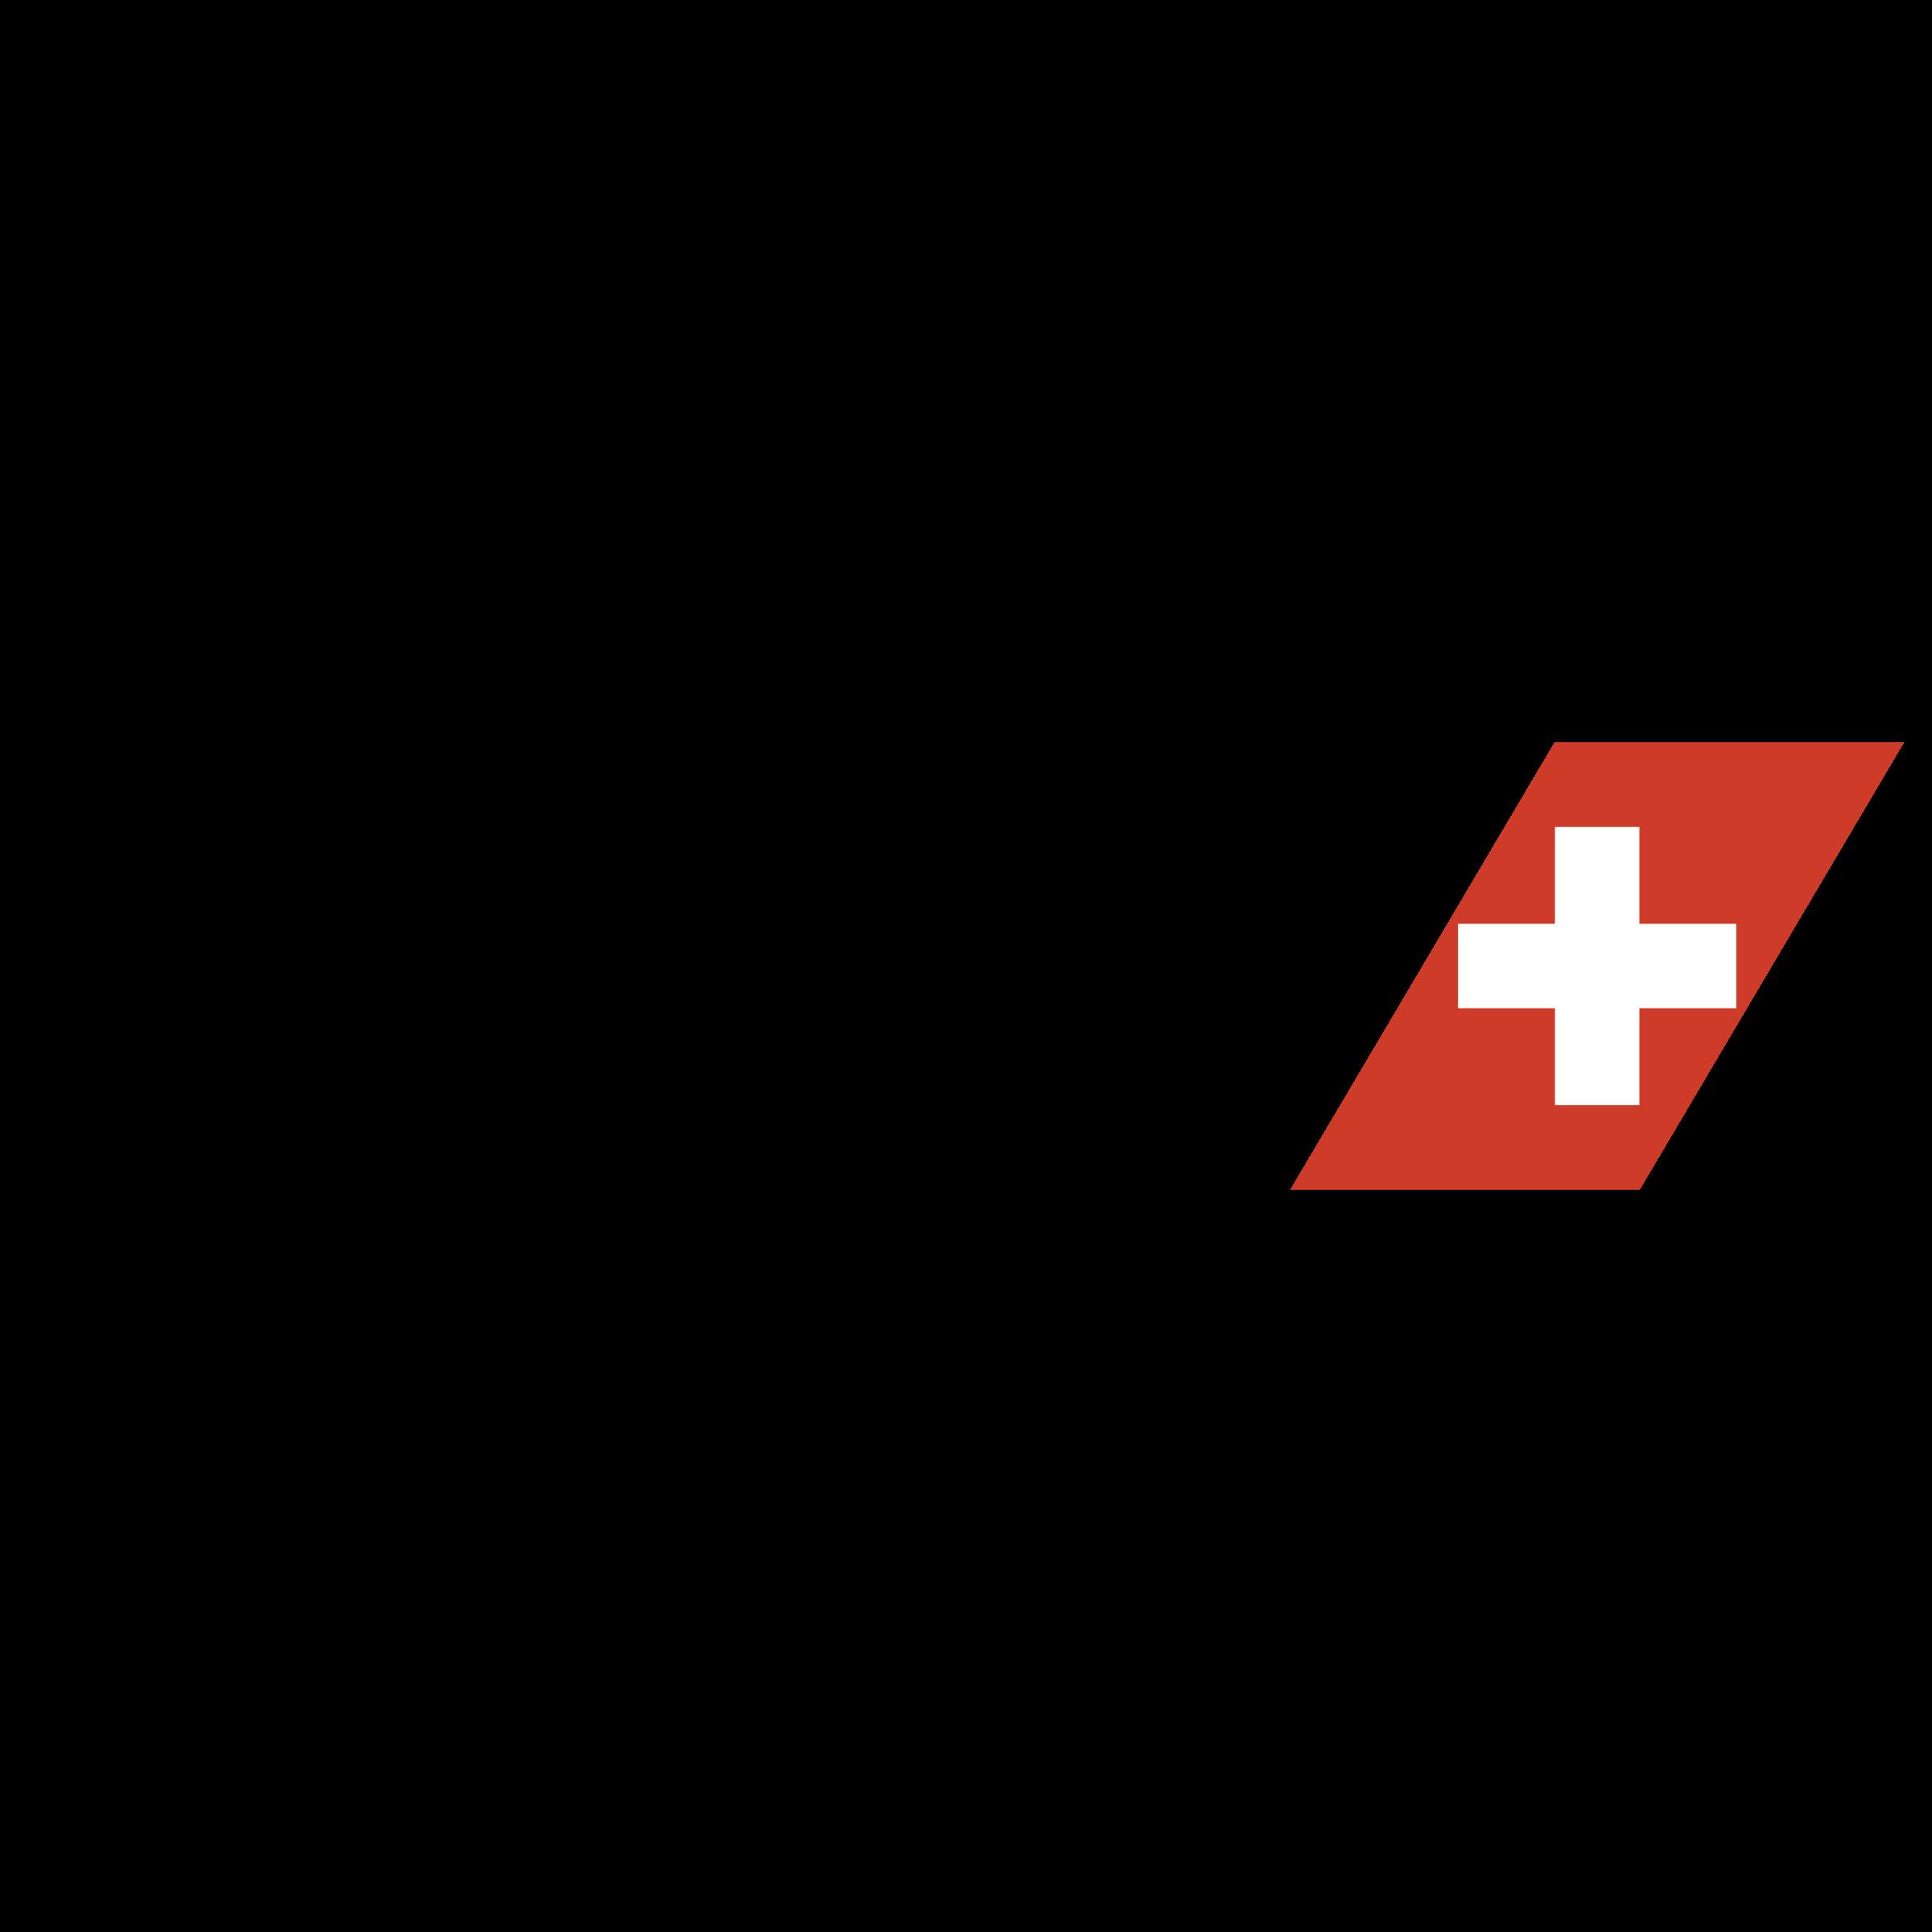 Swissair Logo PNG Transparent & SVG Vector.